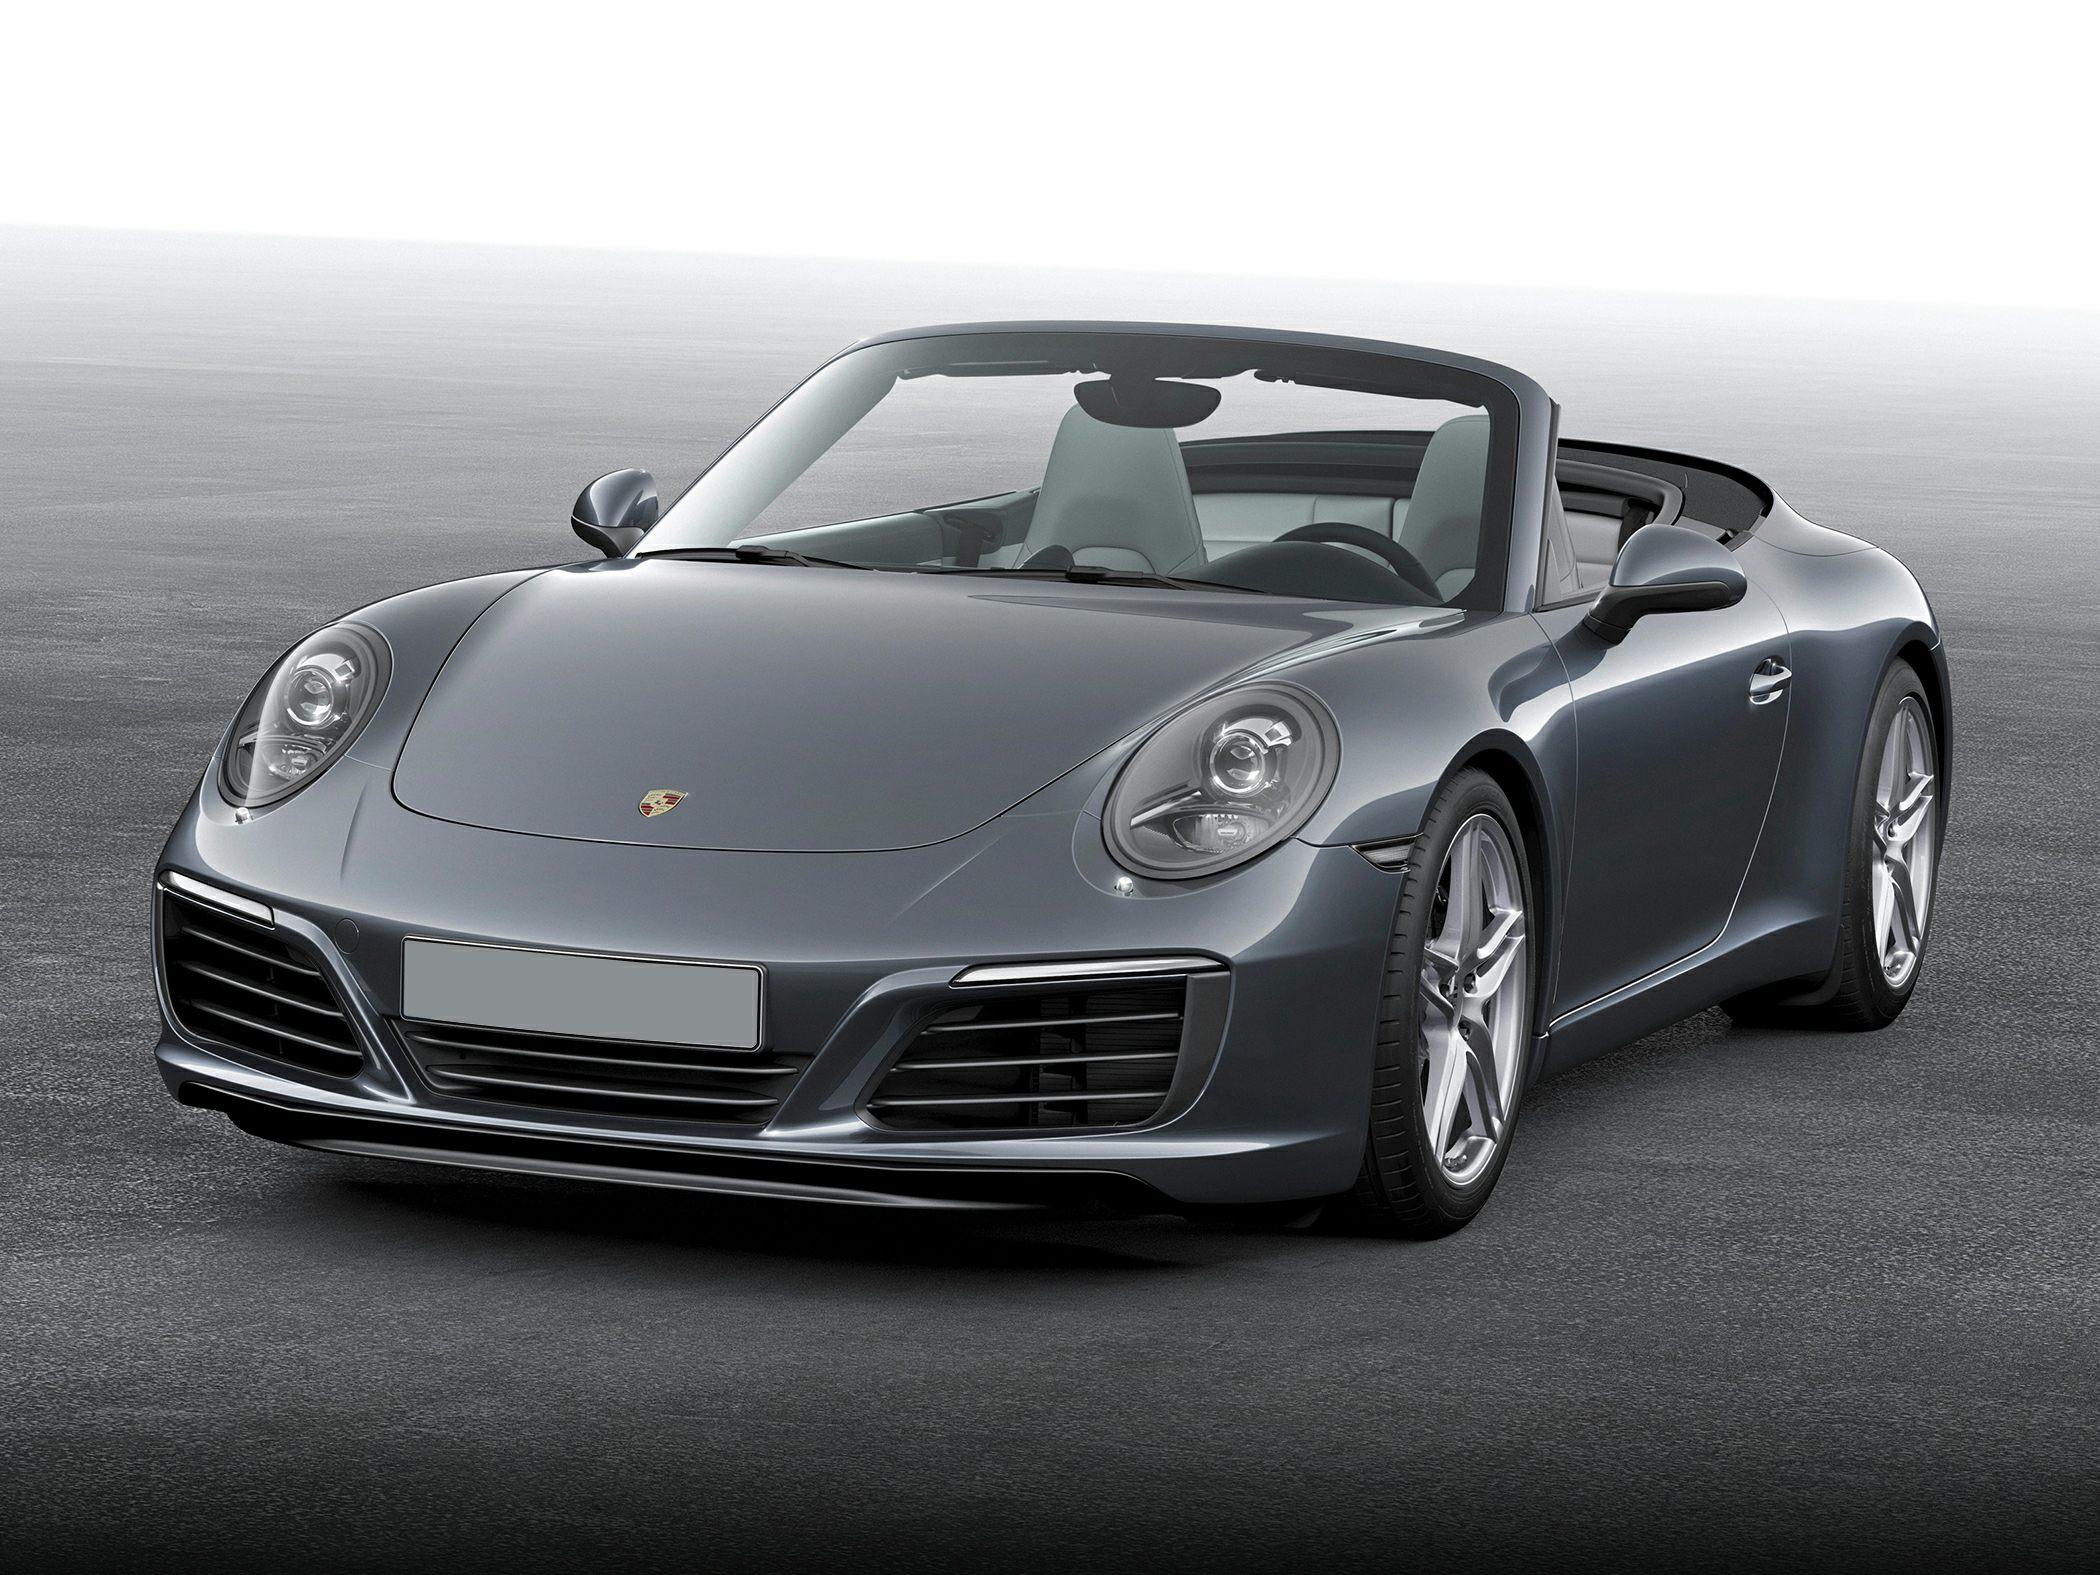 2019 Porsche 911 Carrera GTS 2dr Rear wheel Drive Cabriolet for Sale